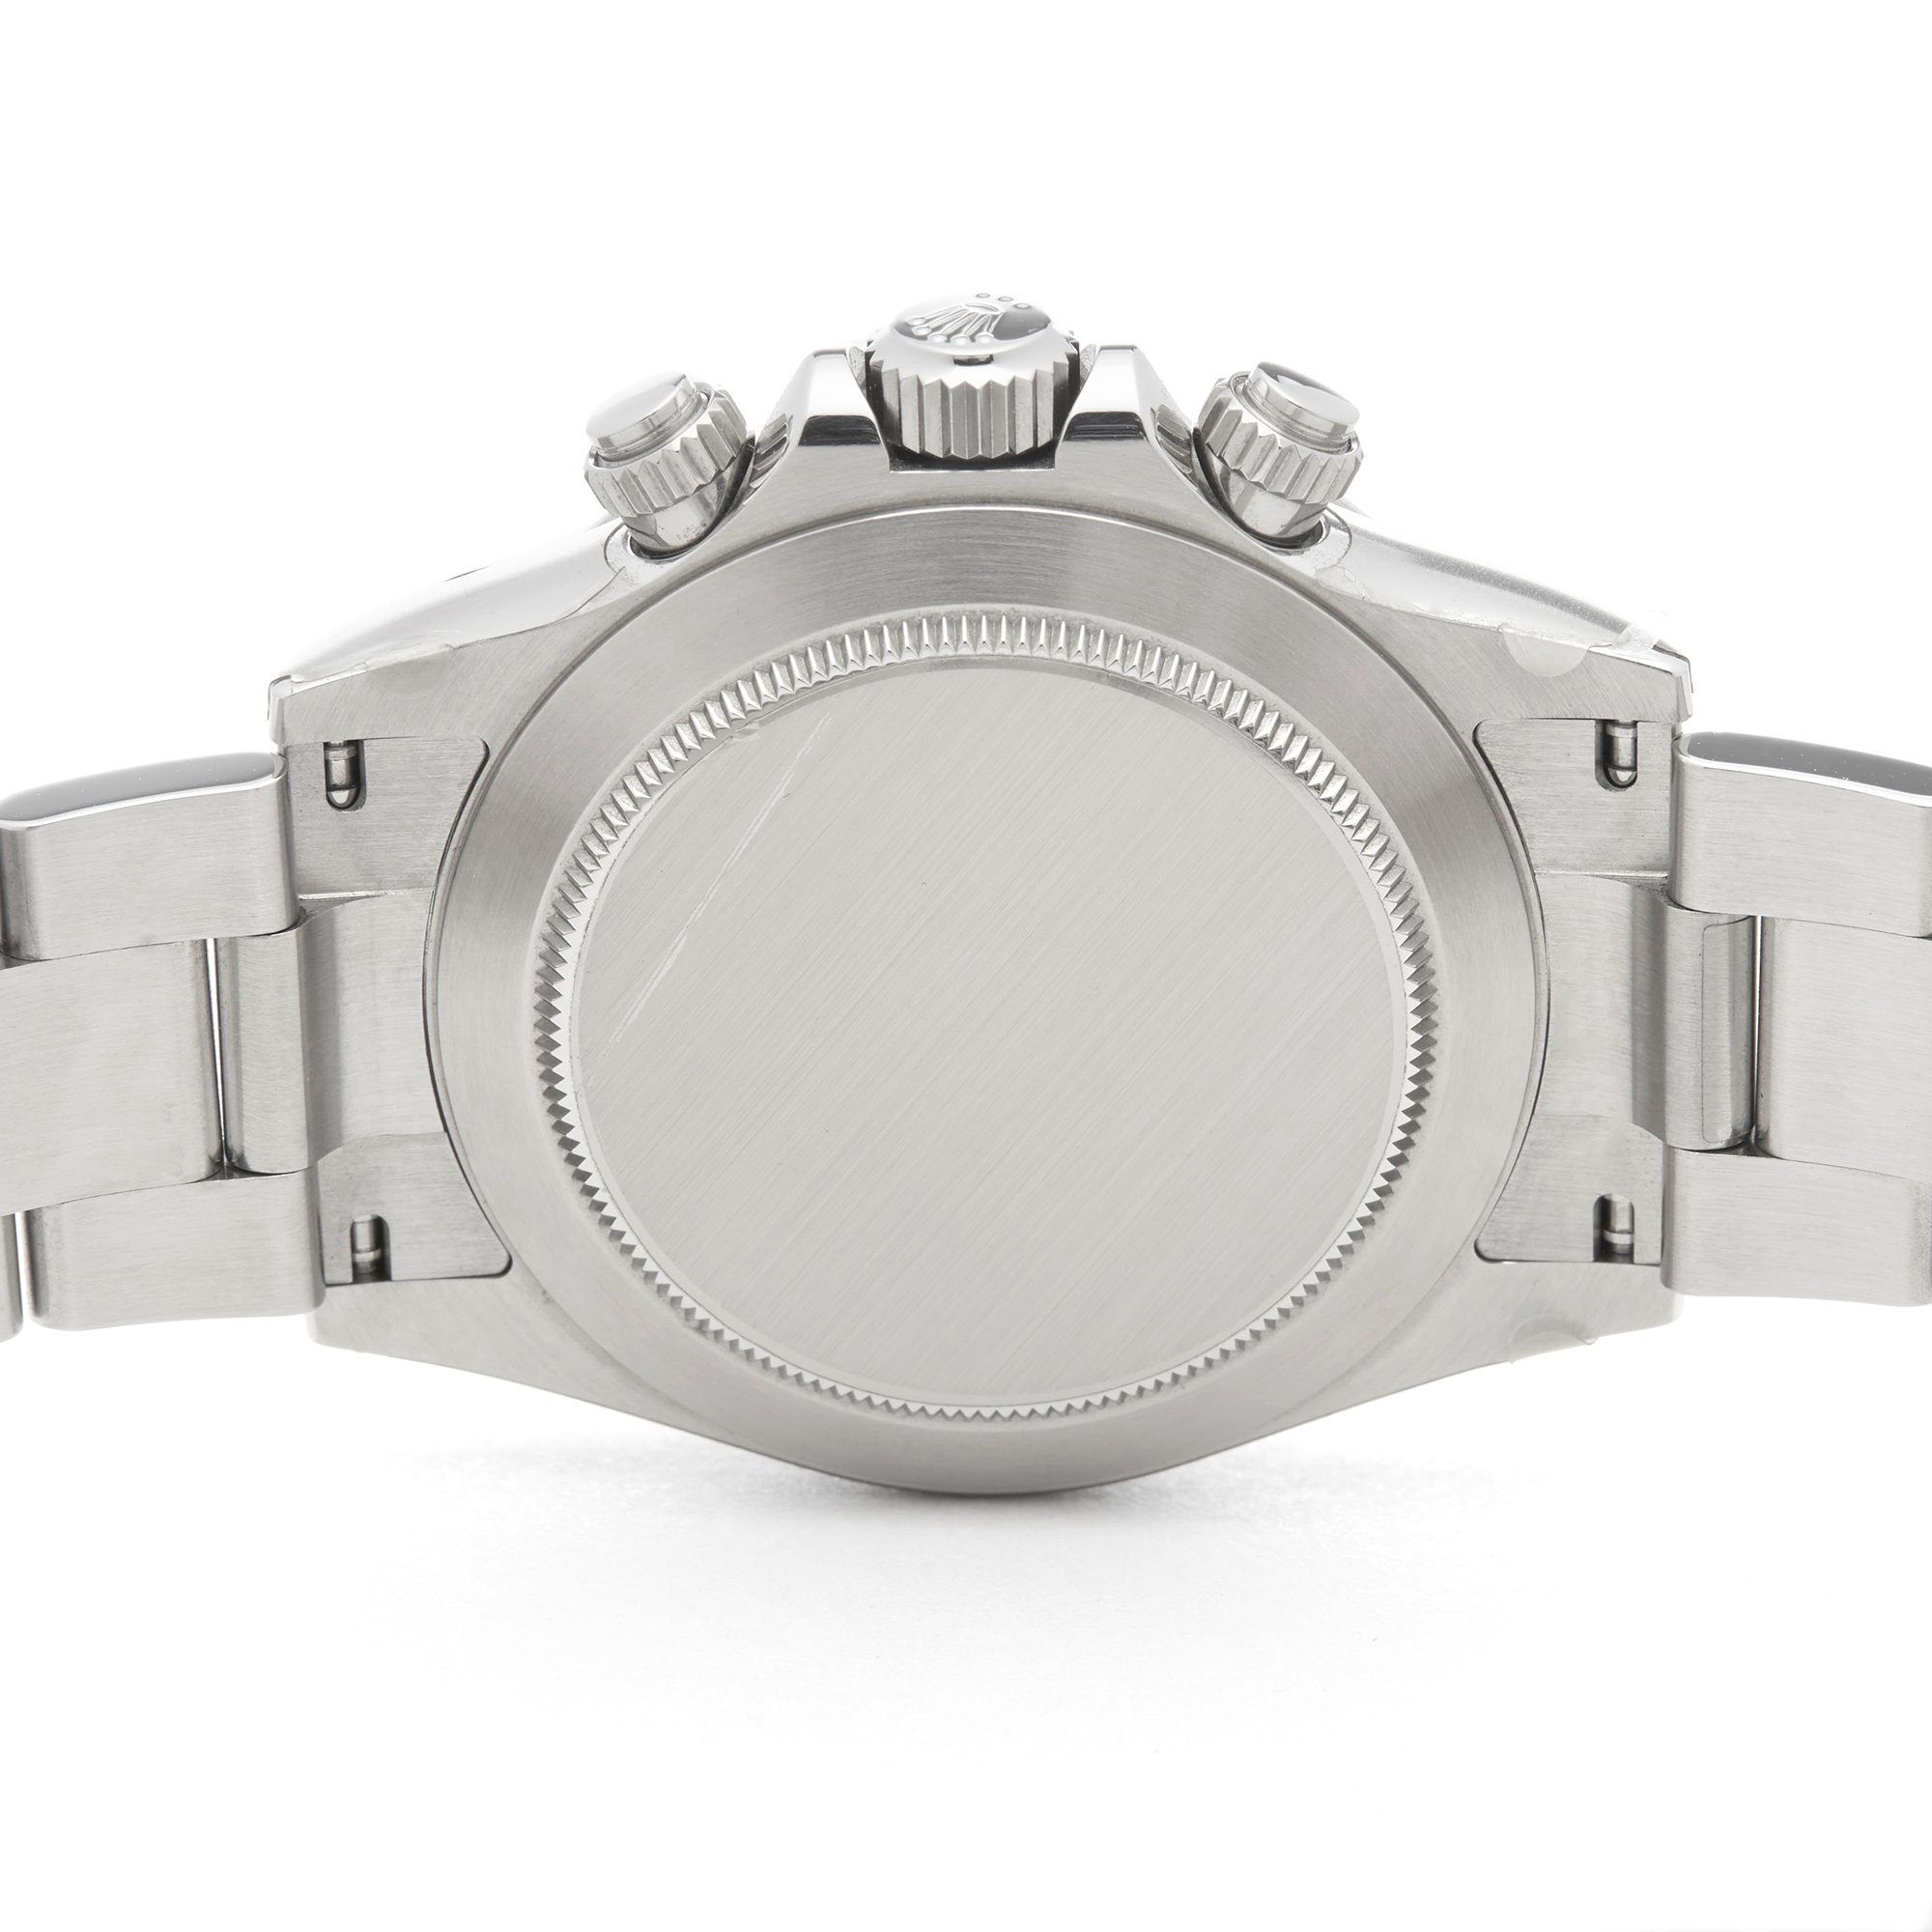 Rolex Daytona Chromalight NOS Stainless Steel 116520